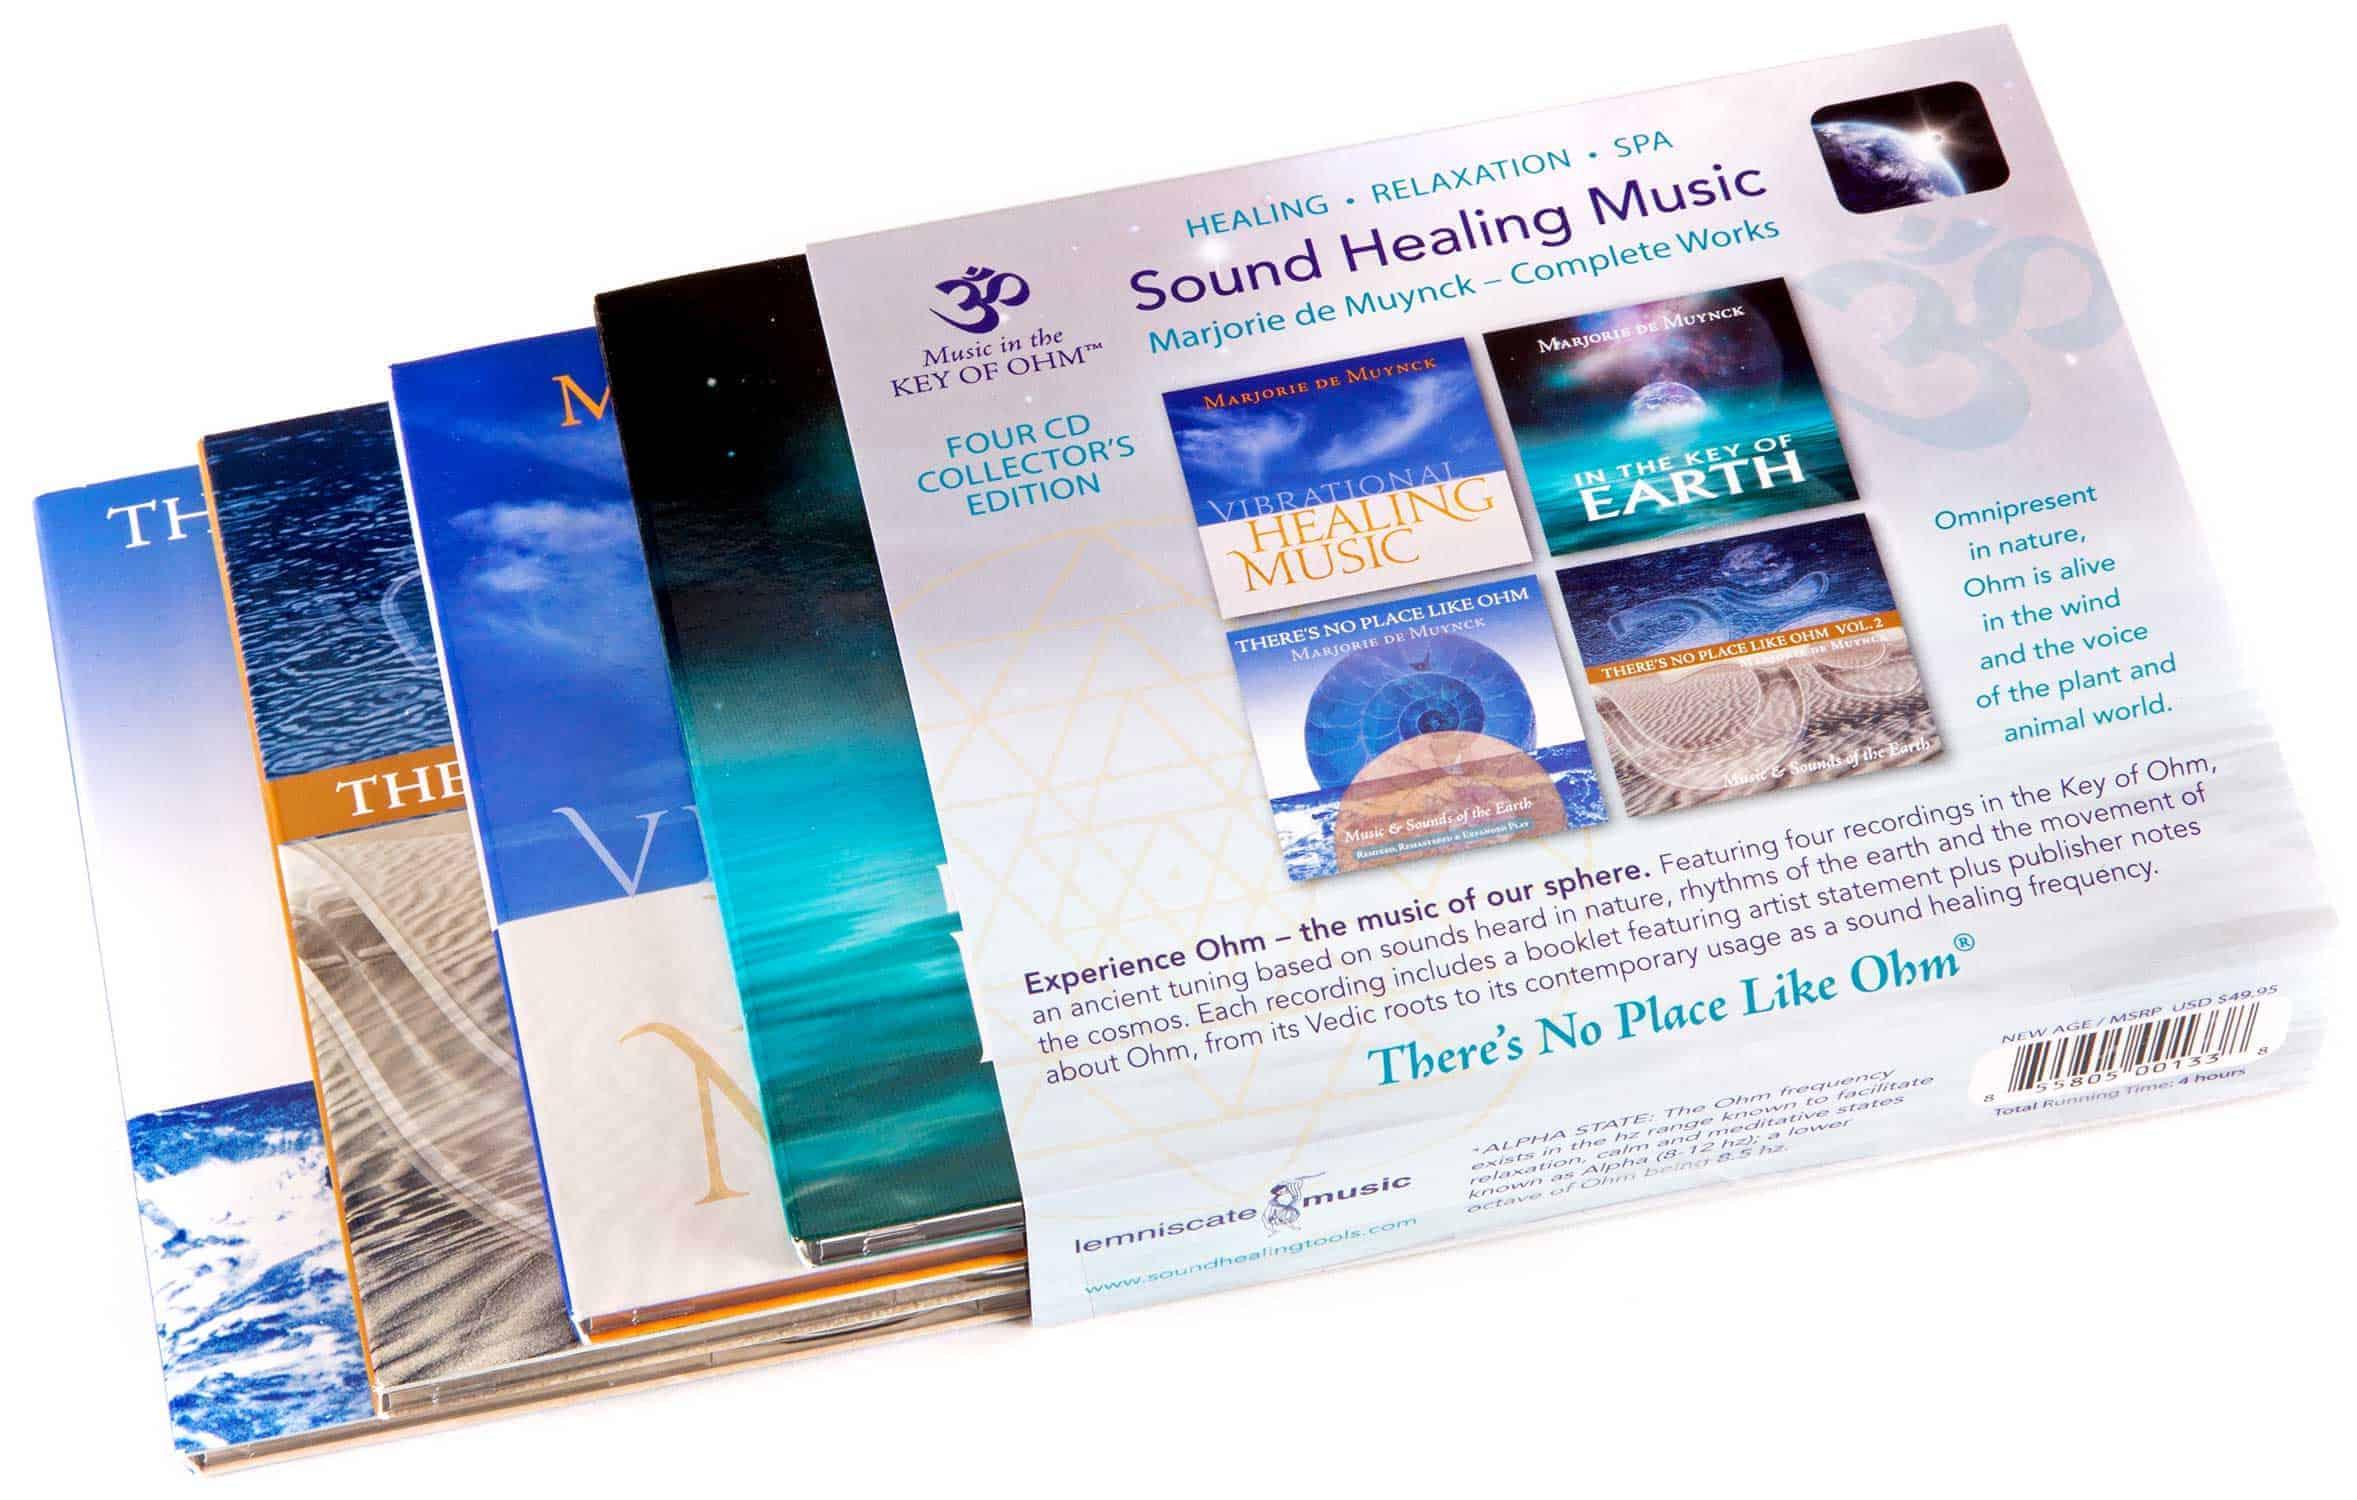 sound healing music 4-CD Set